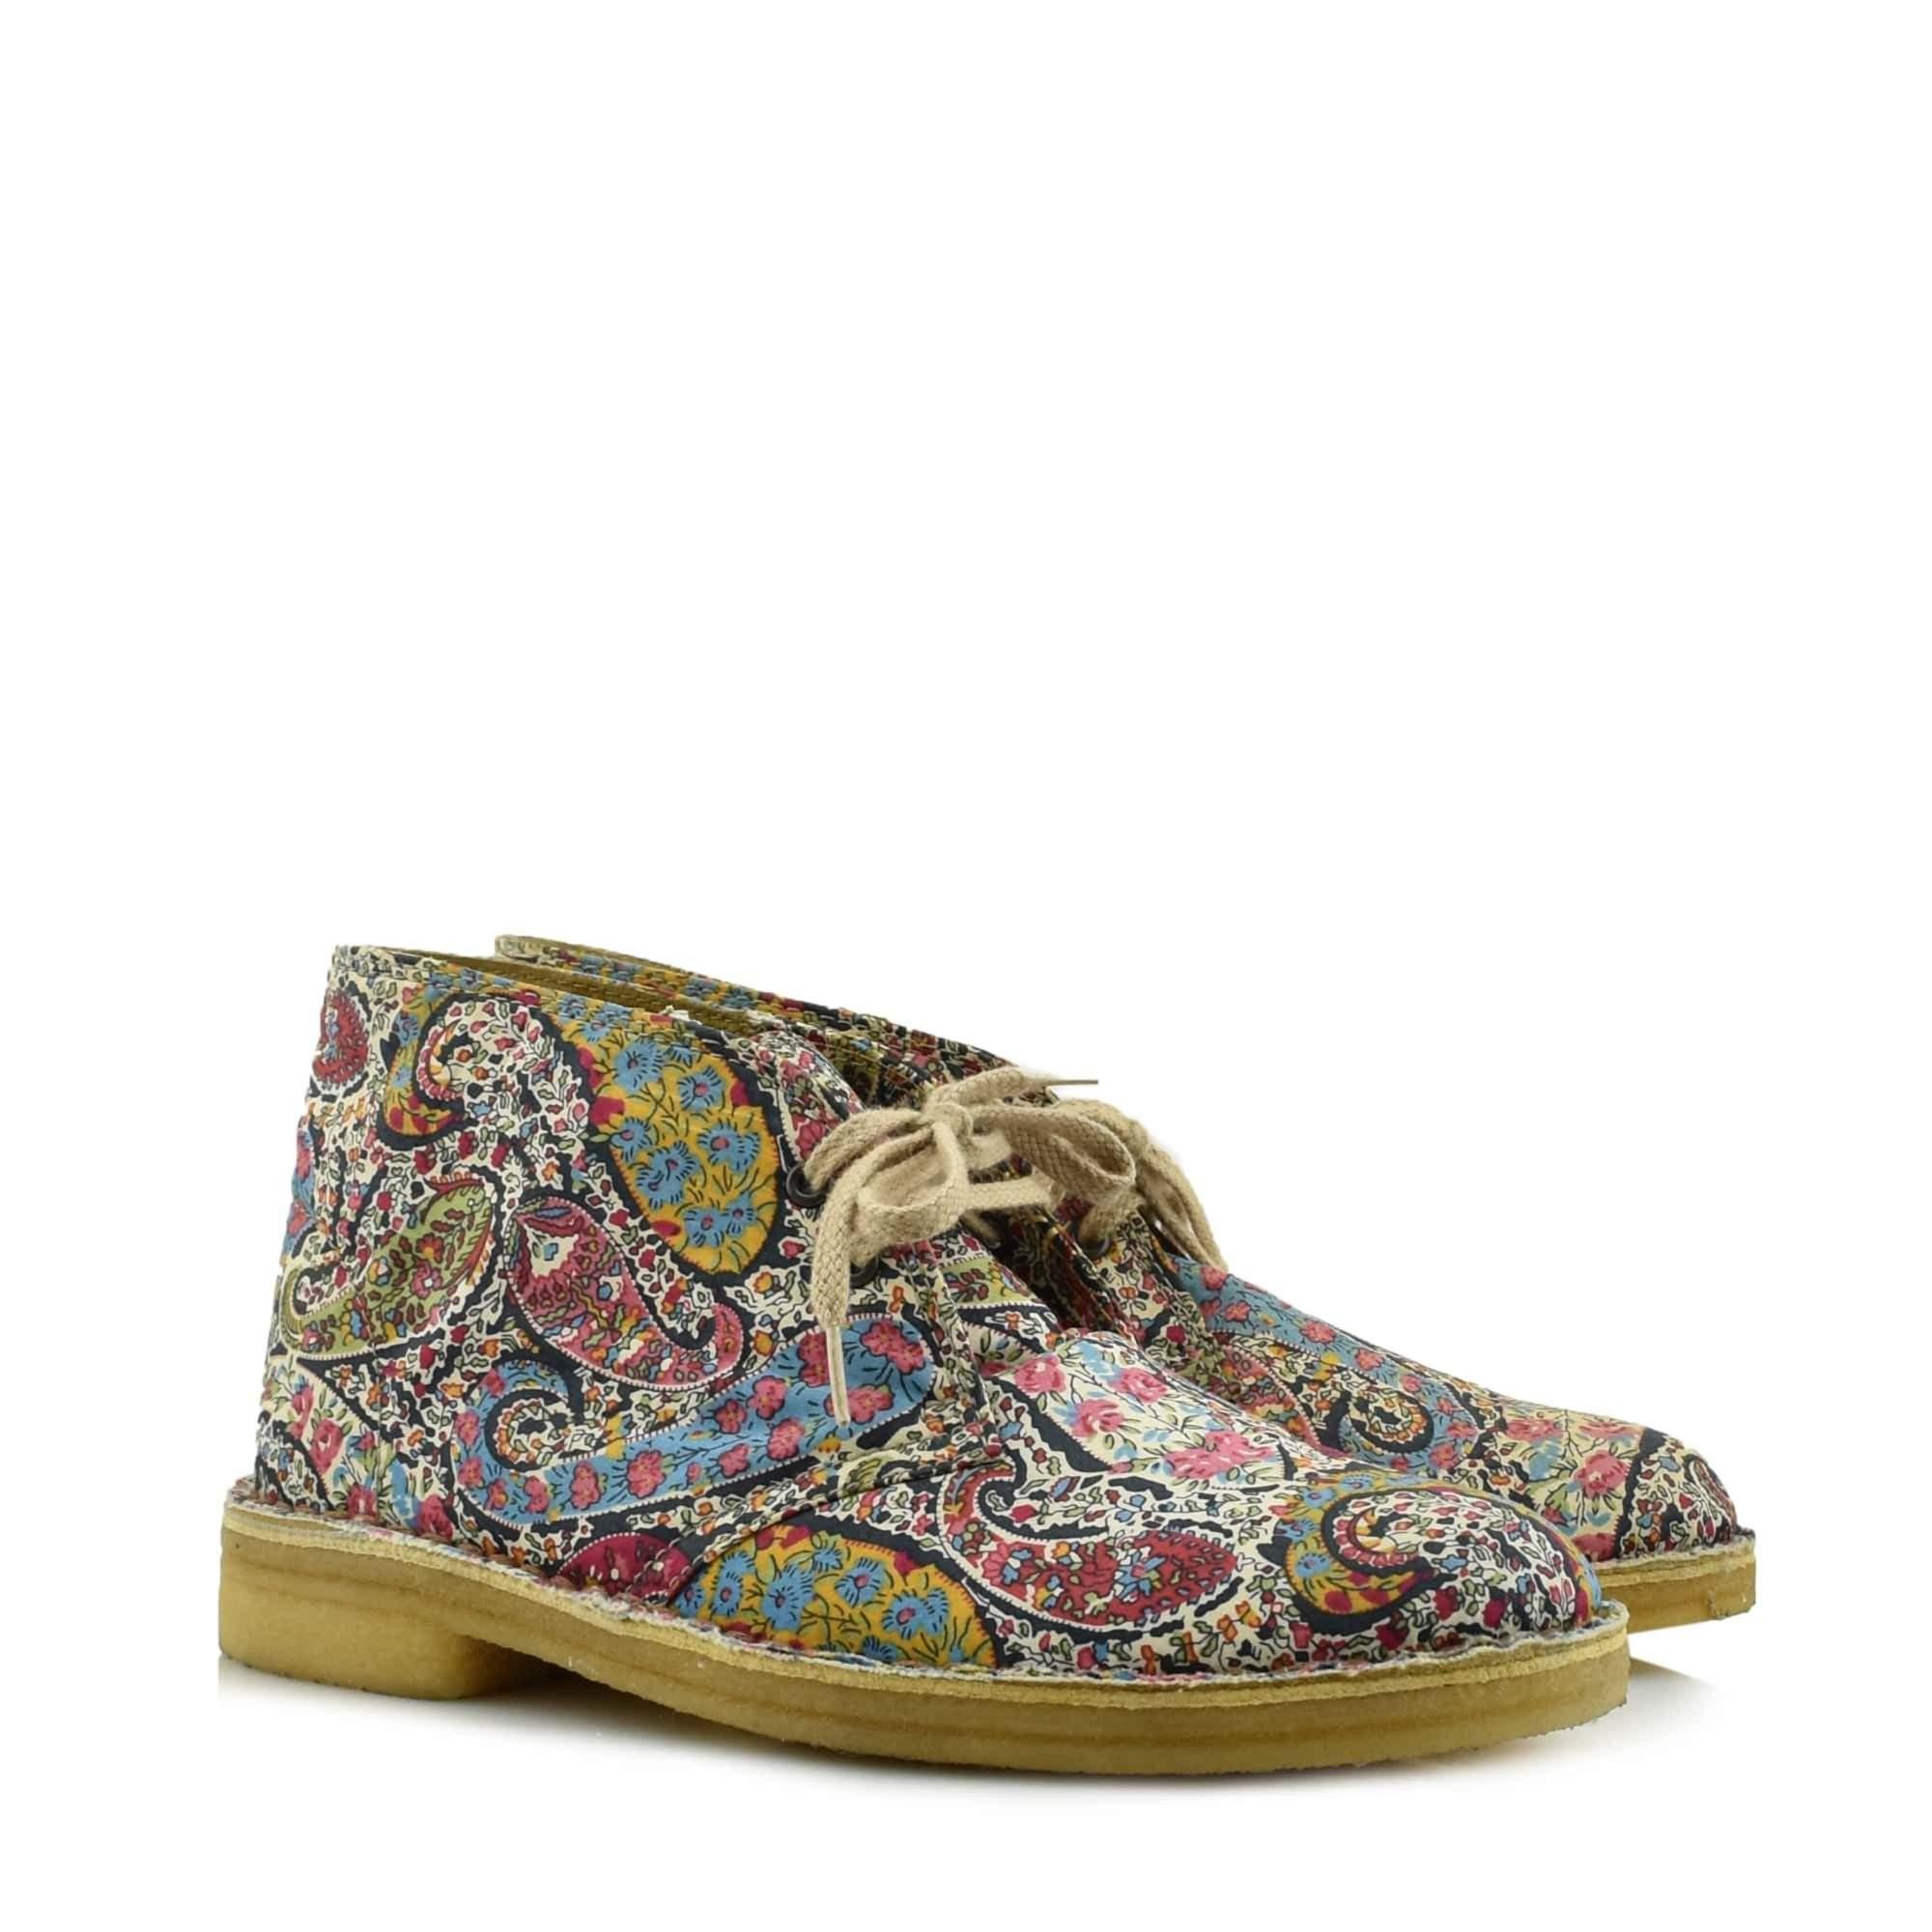 11a8435ad06 Προσφορές Dion Shop - Προσφορές Γυναικεία Παπούτσια από τα ...